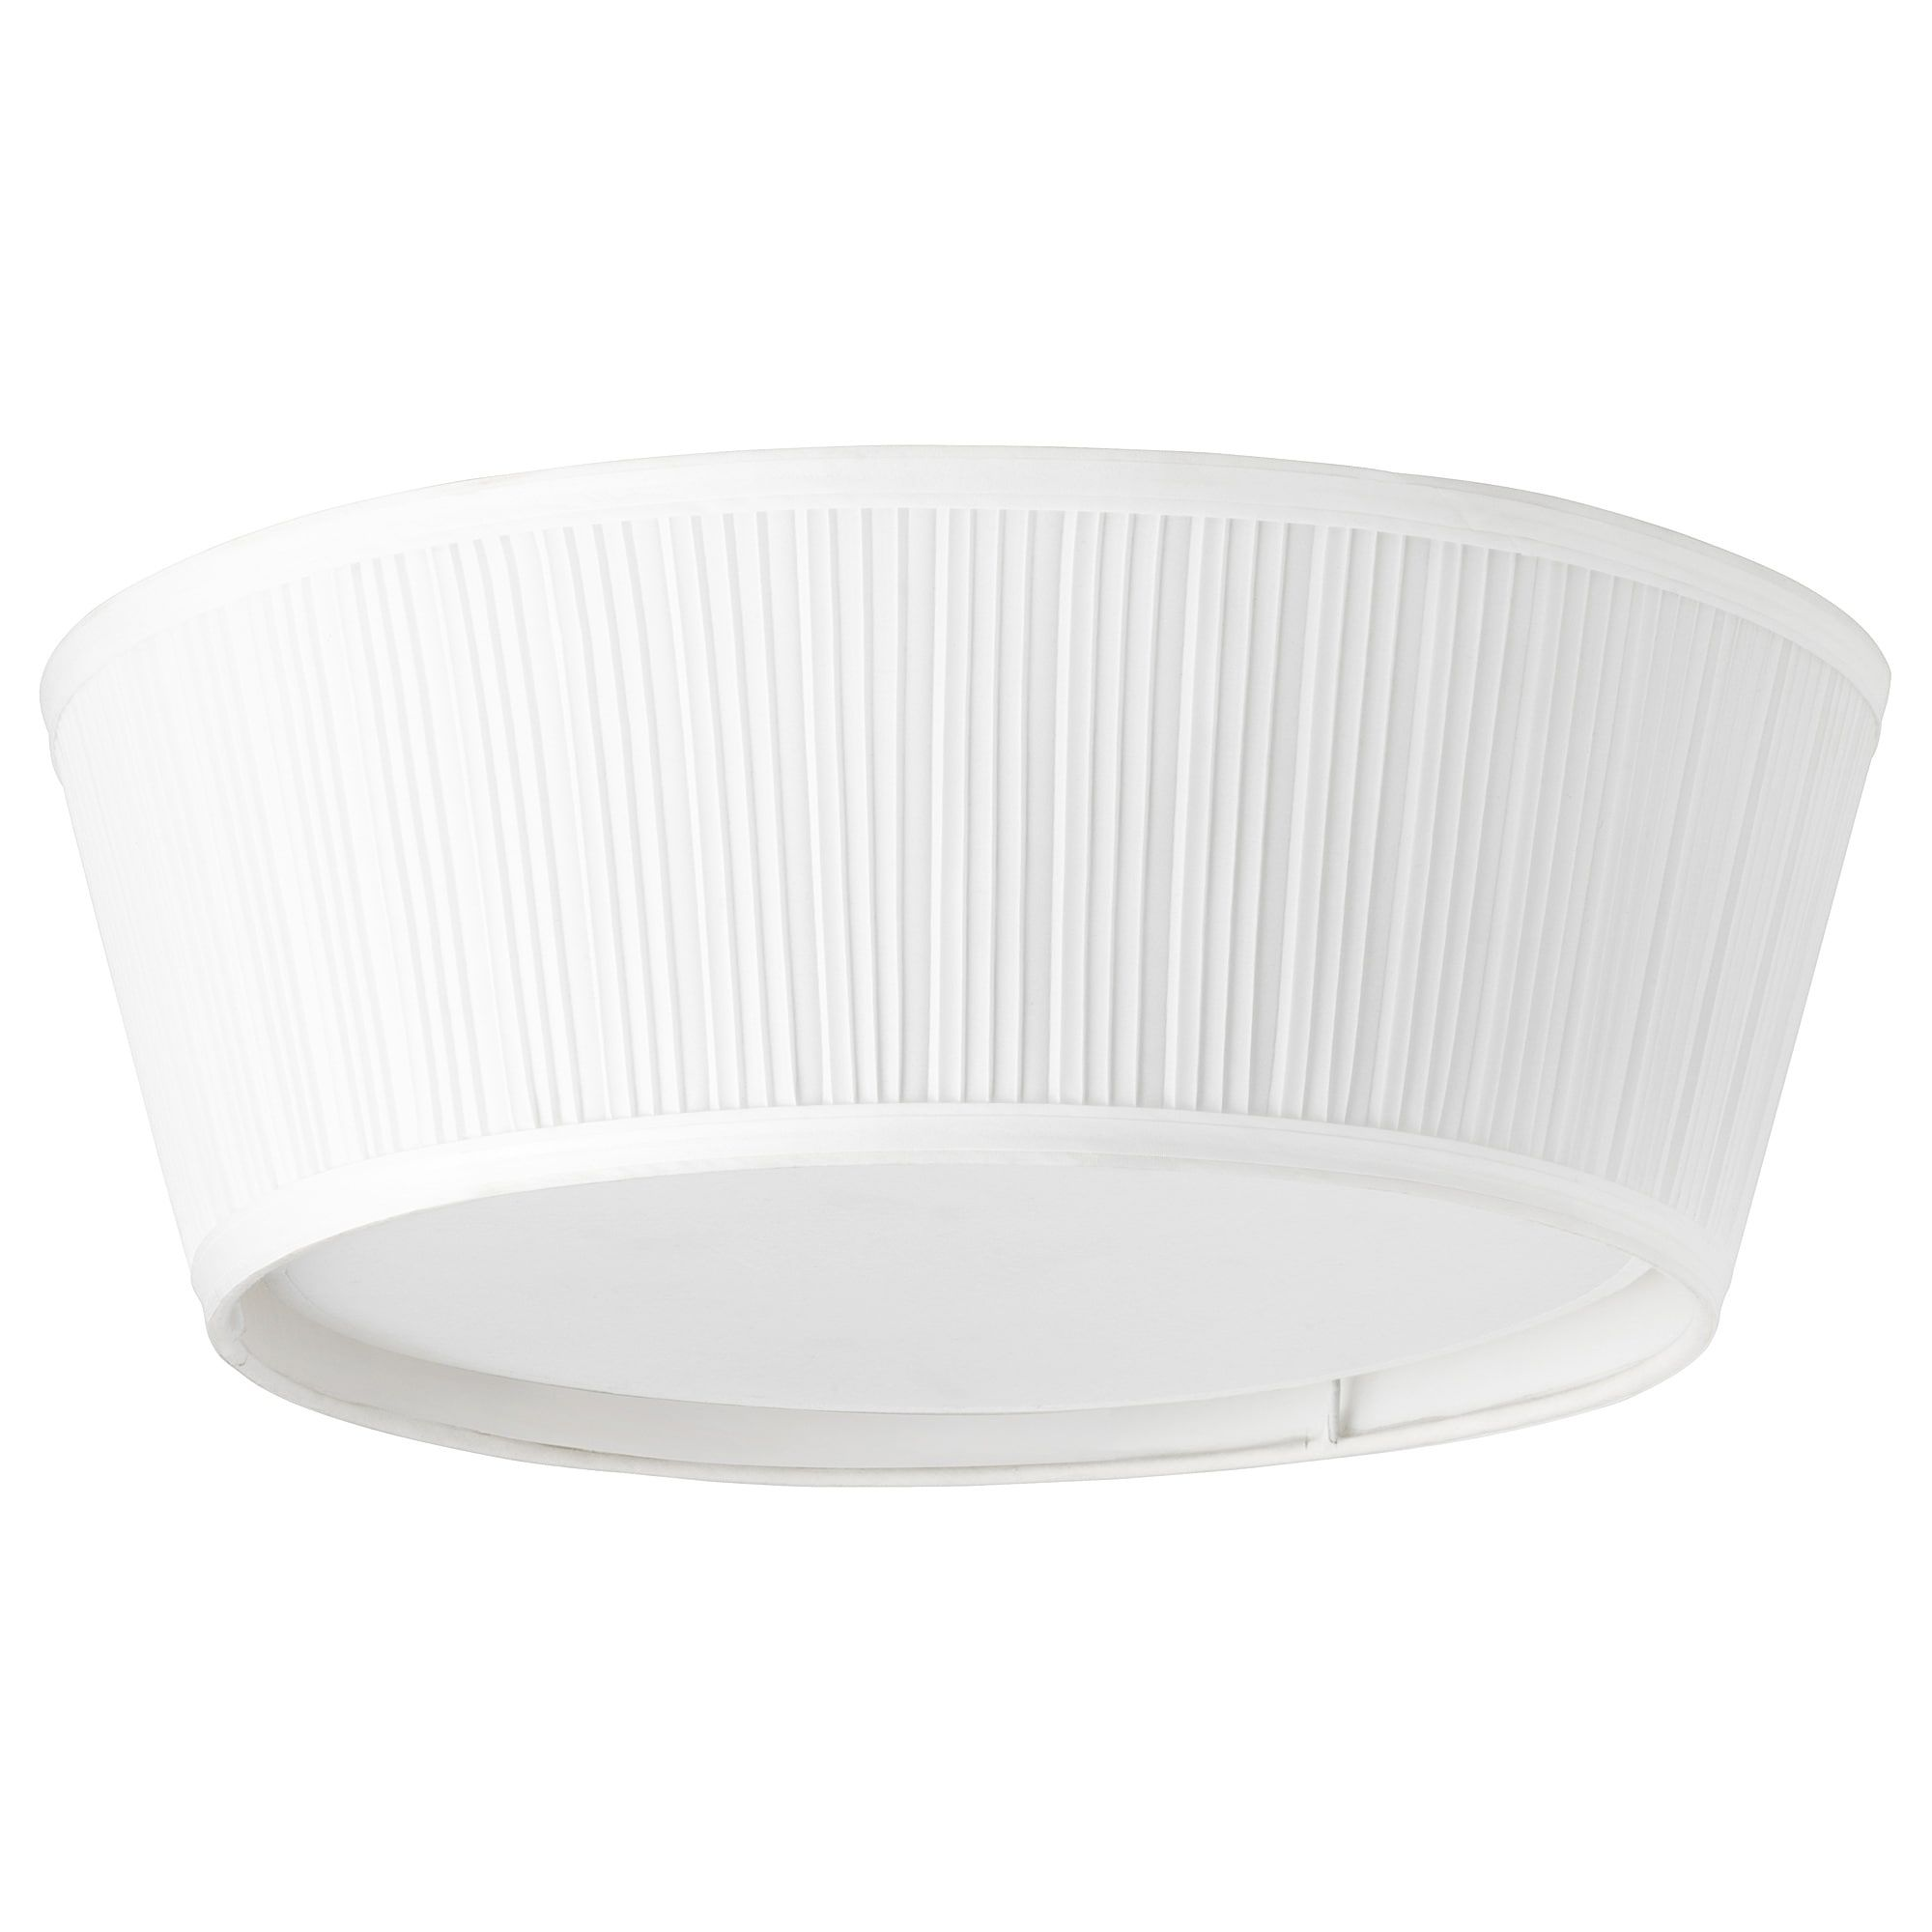 IKEA ARSTID White Ceiling lamp | Ceiling lamp, Ceiling lamp